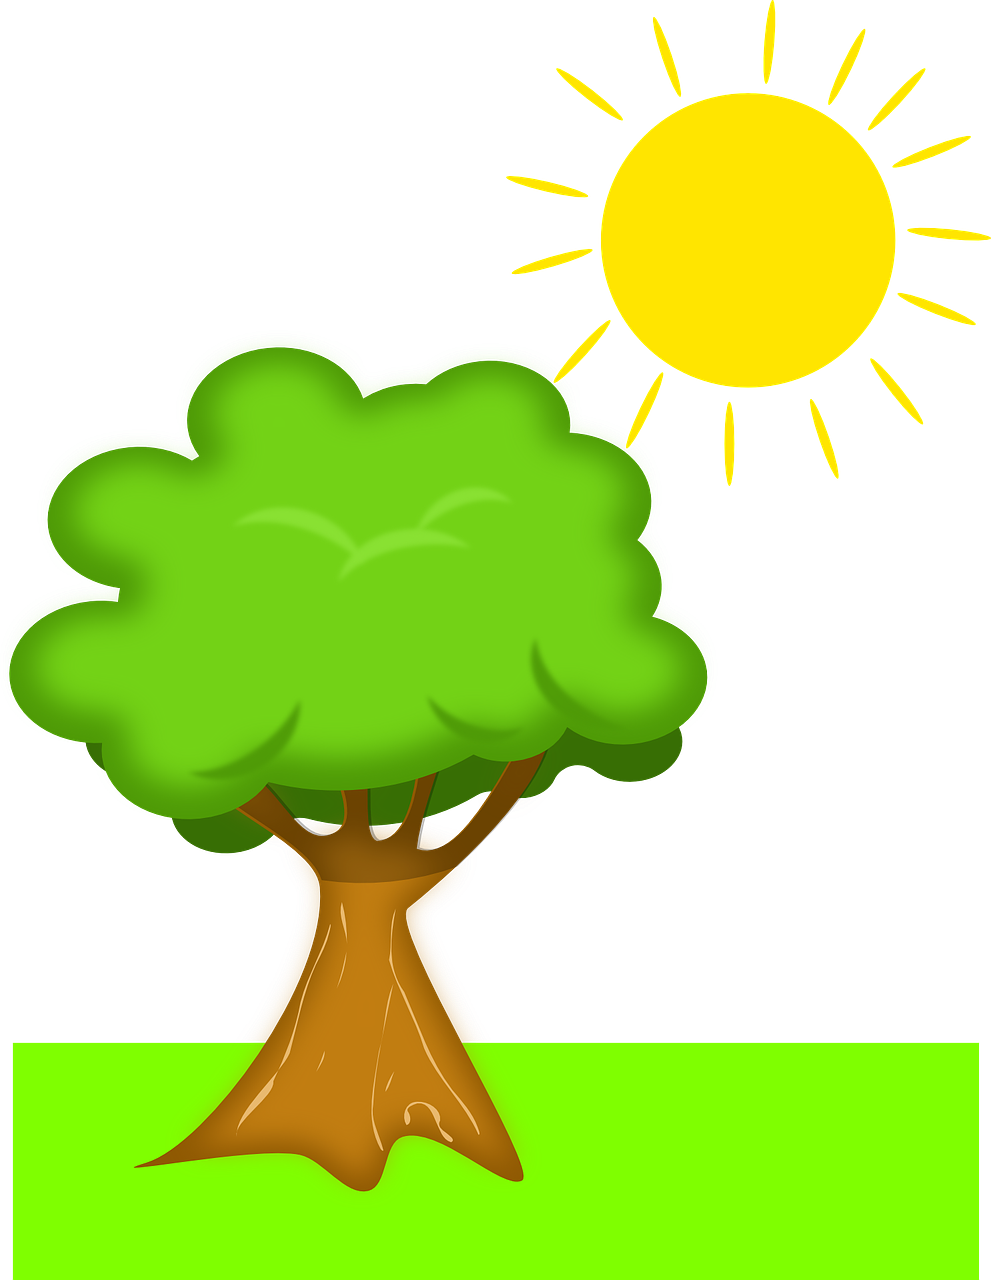 A tree under the sun.